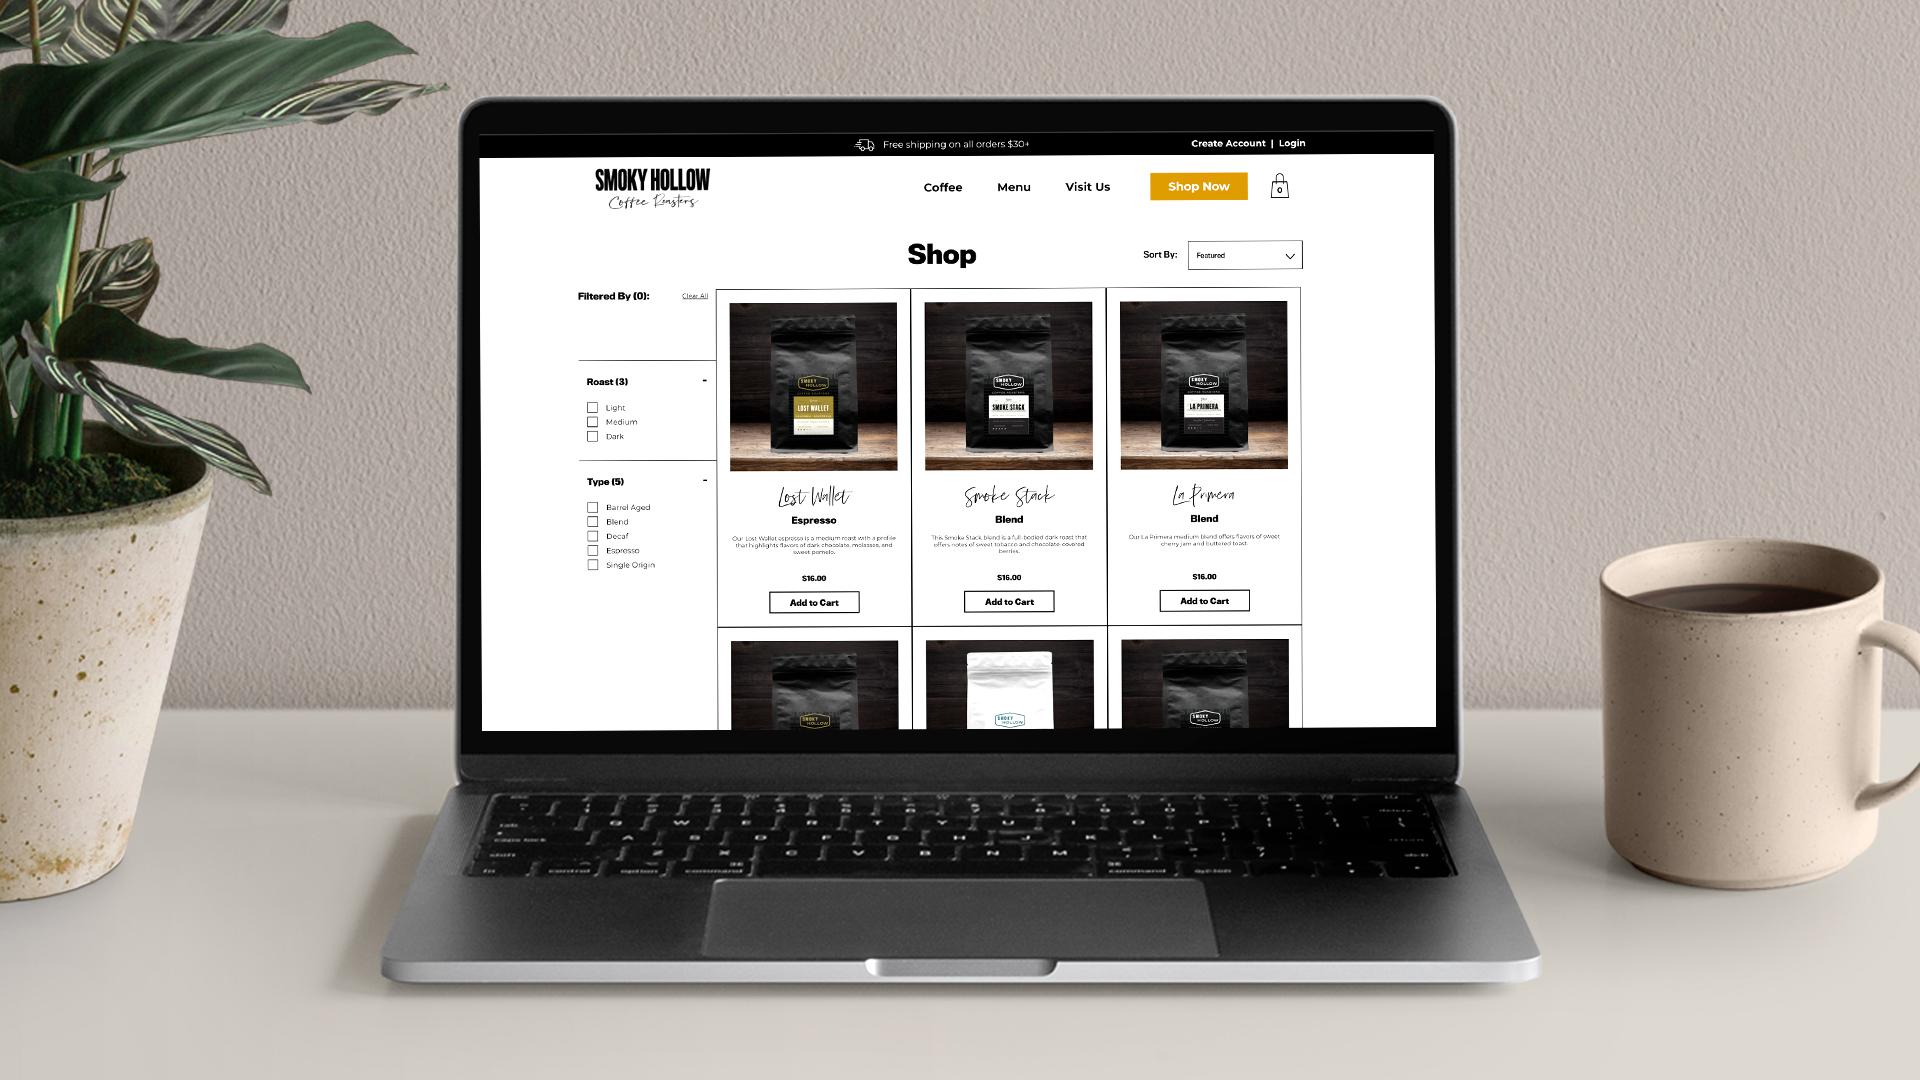 Smoky Hollow Coffee Roasters eCommerce Website